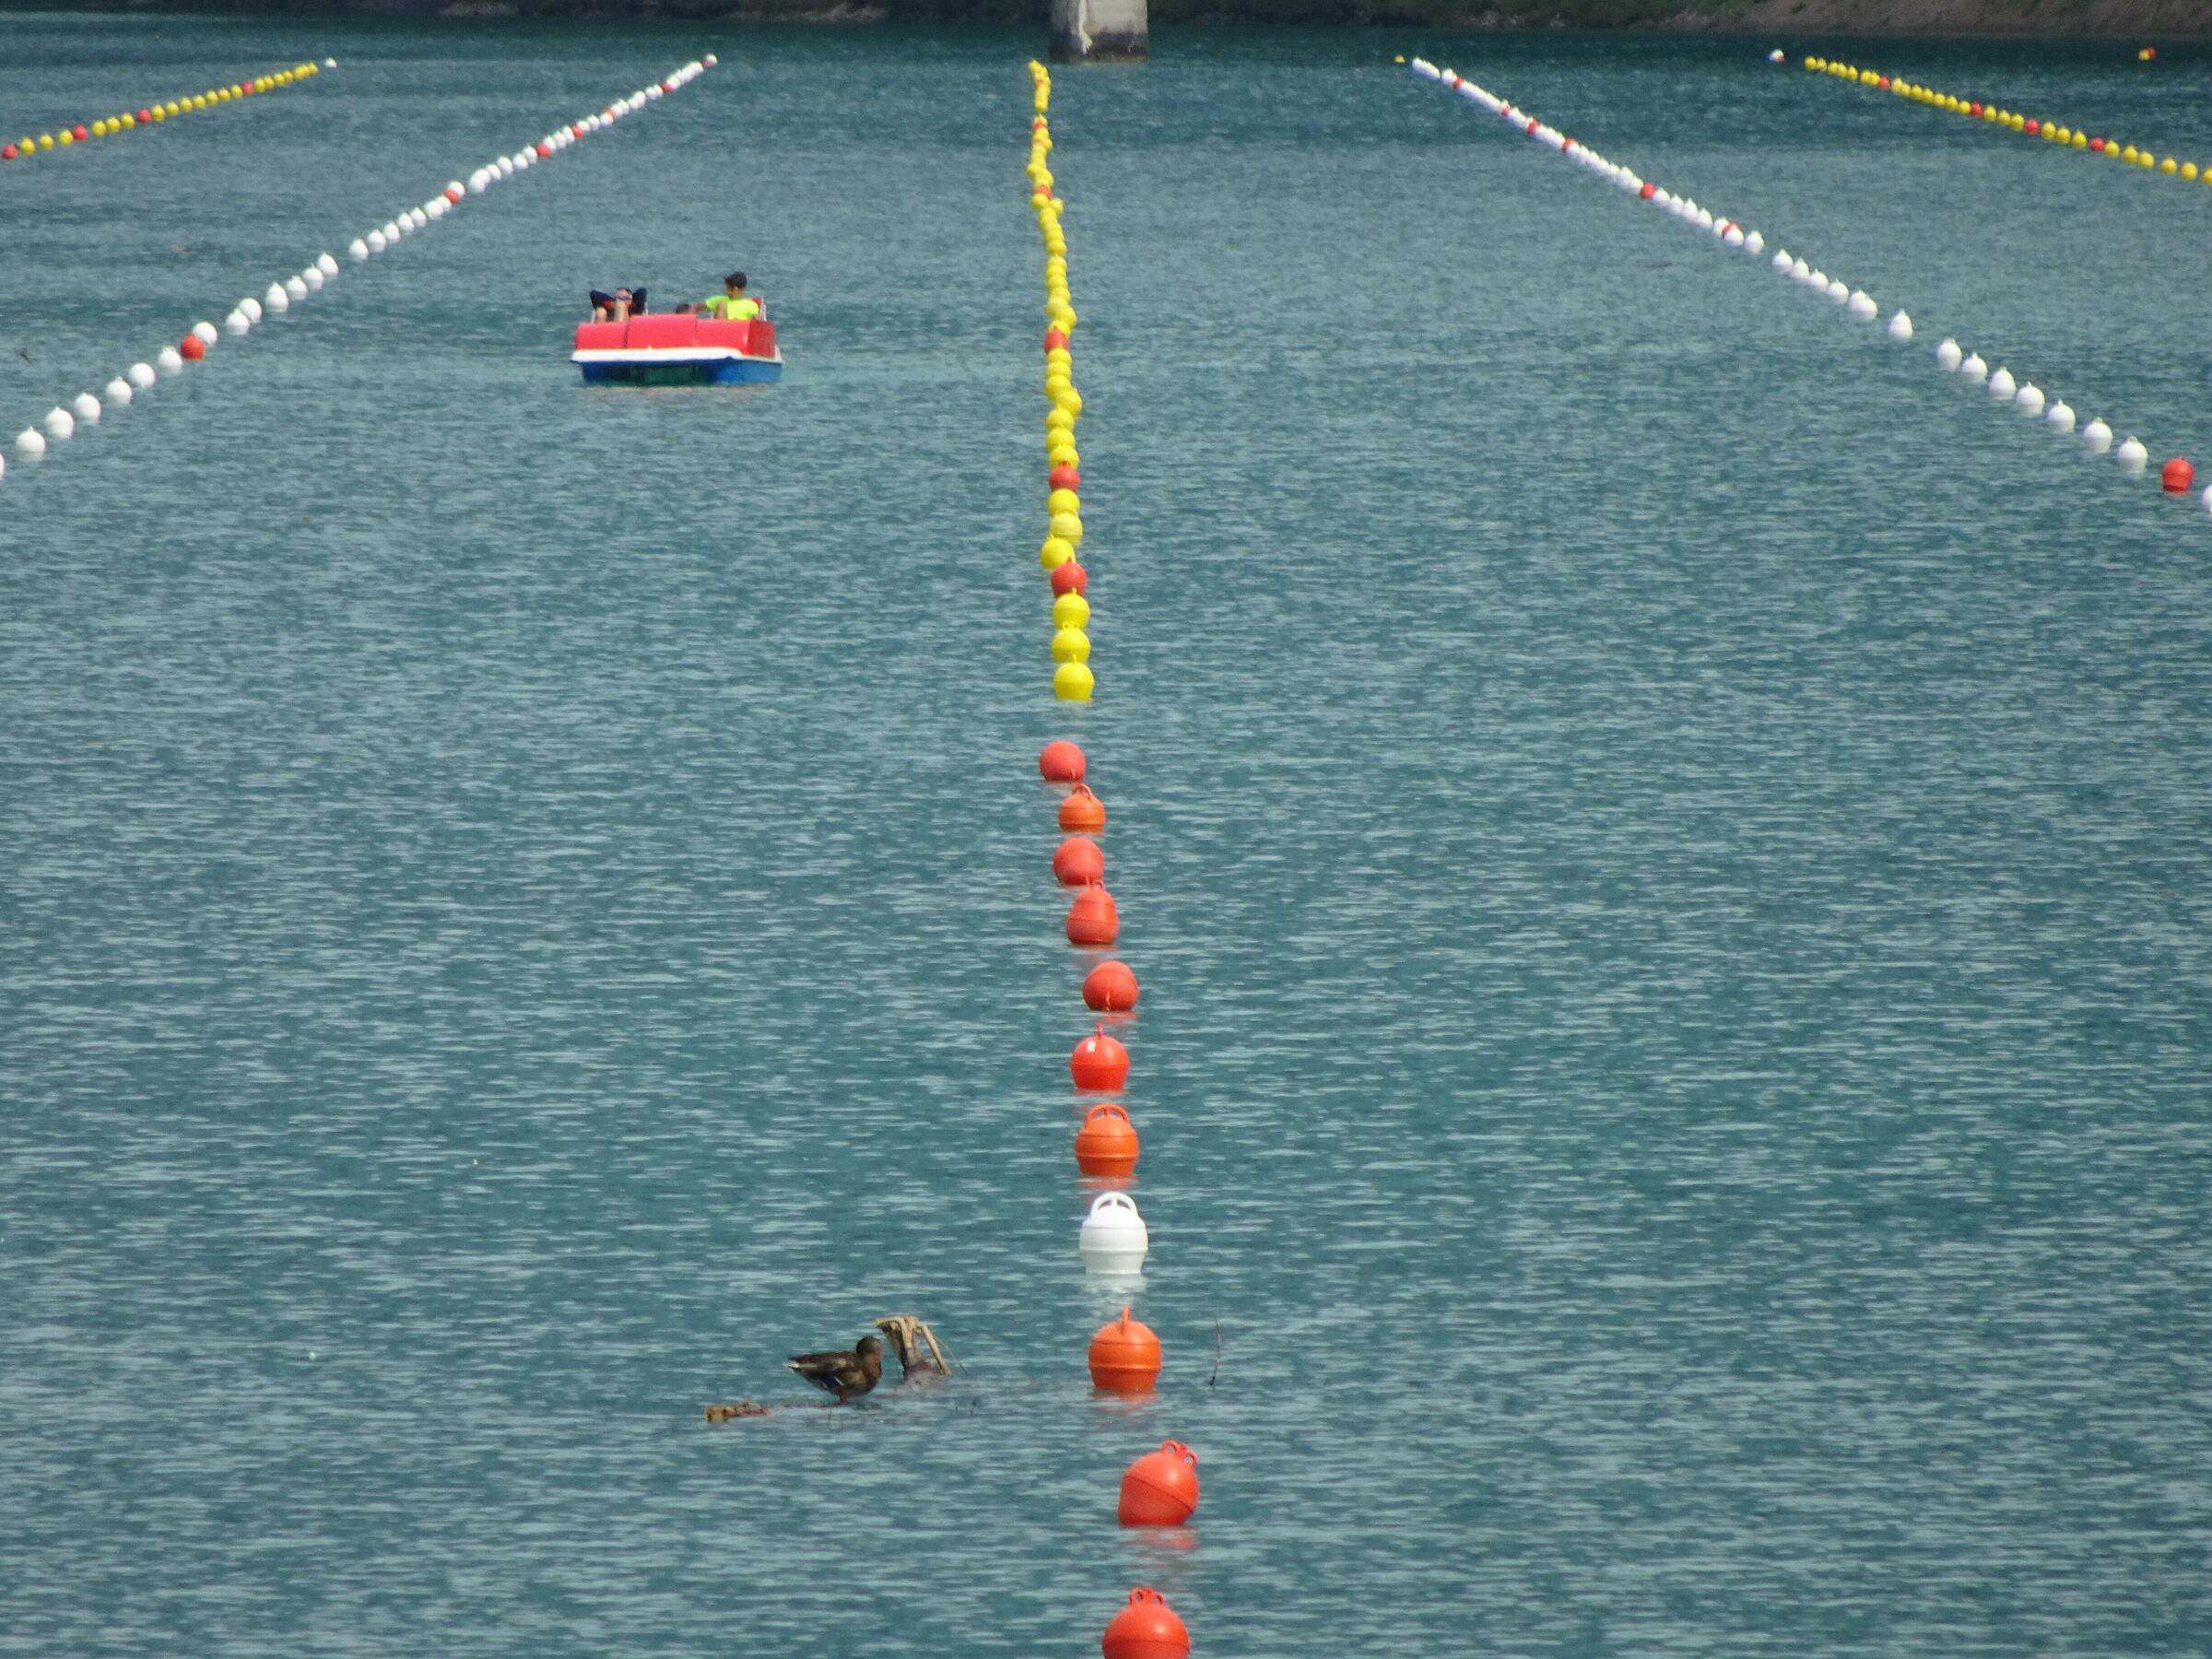 Going for Lakes: Auronzo di Cadore 2...